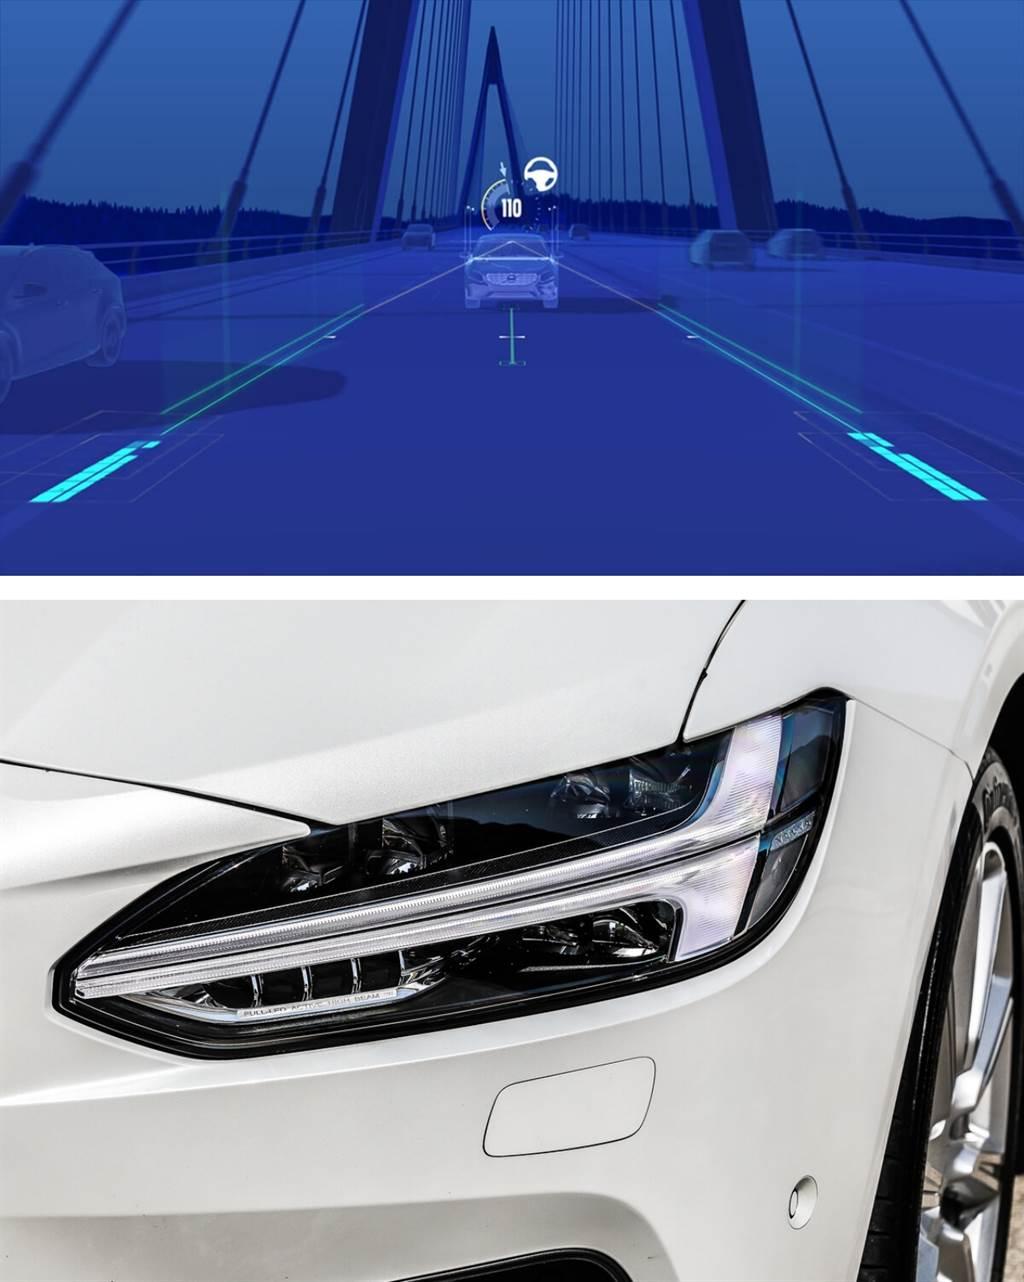 T形「雷神之鎚」頭燈為新世代Volvo外觀上的主要識別。而且更值得一提的是,可偵測來車主動變換照射範圍的AHB主動適路性照明系統,為S90全車系標配項目。這個配備在多數進口車款大都還列為加價選配。